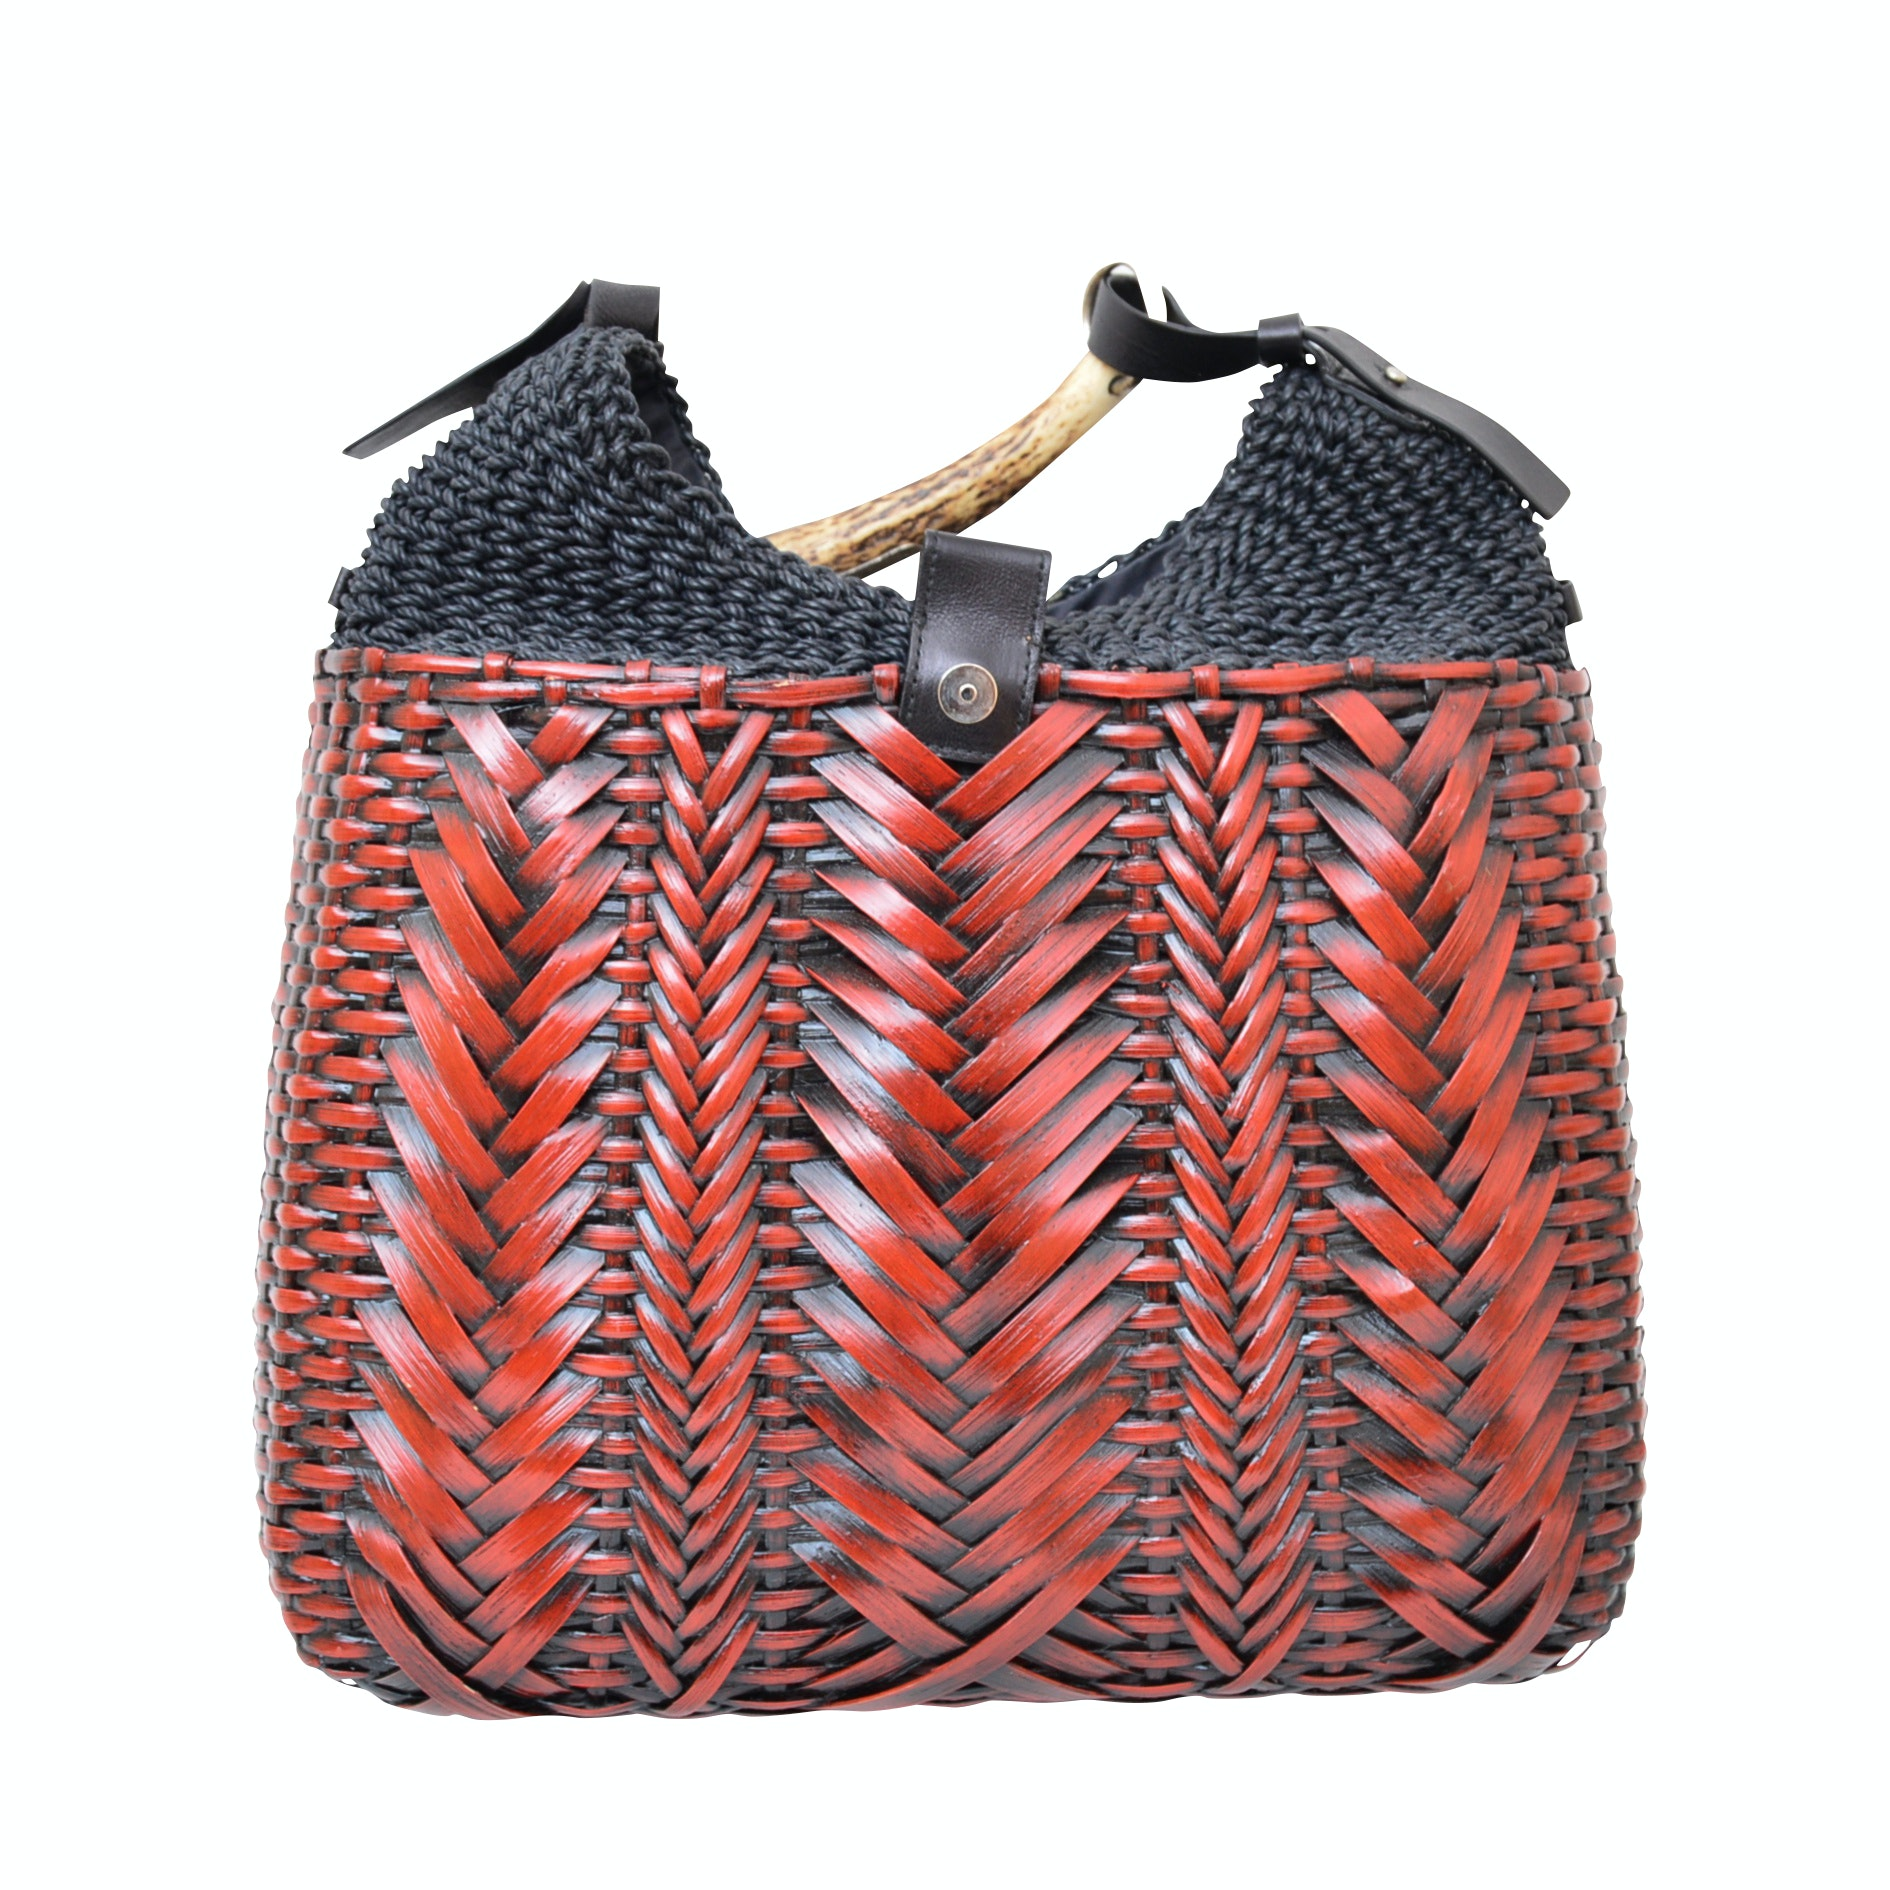 Yves Saint Laurent Woven Rattan and Fabric Handbag with Horn Handle